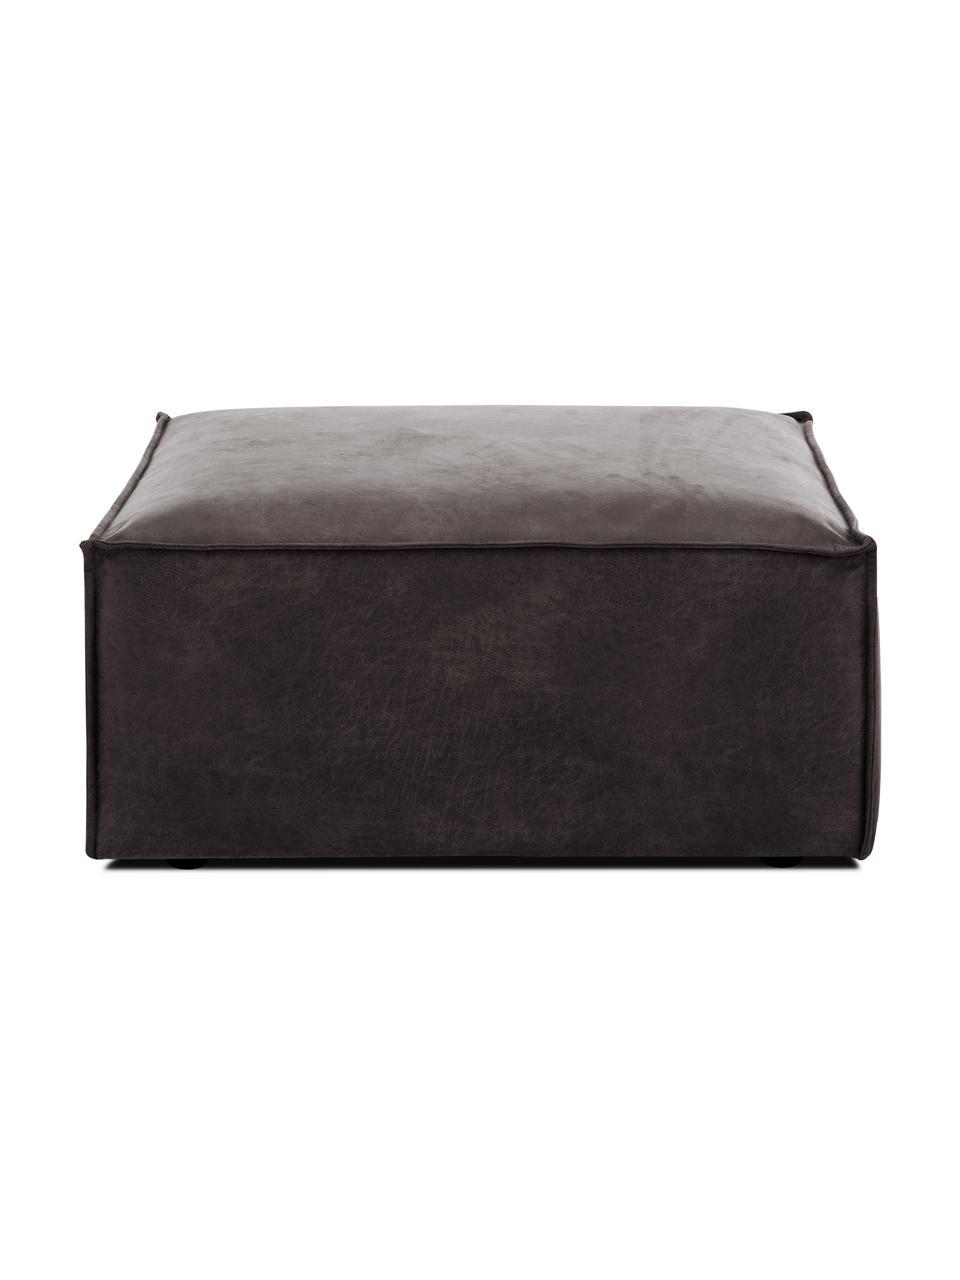 Sofa-Hocker Lennon in Braungrau aus recyceltem Leder, Bezug: Recyceltes Leder (70% Led, Gestell: Massives Kiefernholz, Spe, Füße: Kunststoff Die Füße befin, Leder Braungrau, 88 x 43 cm